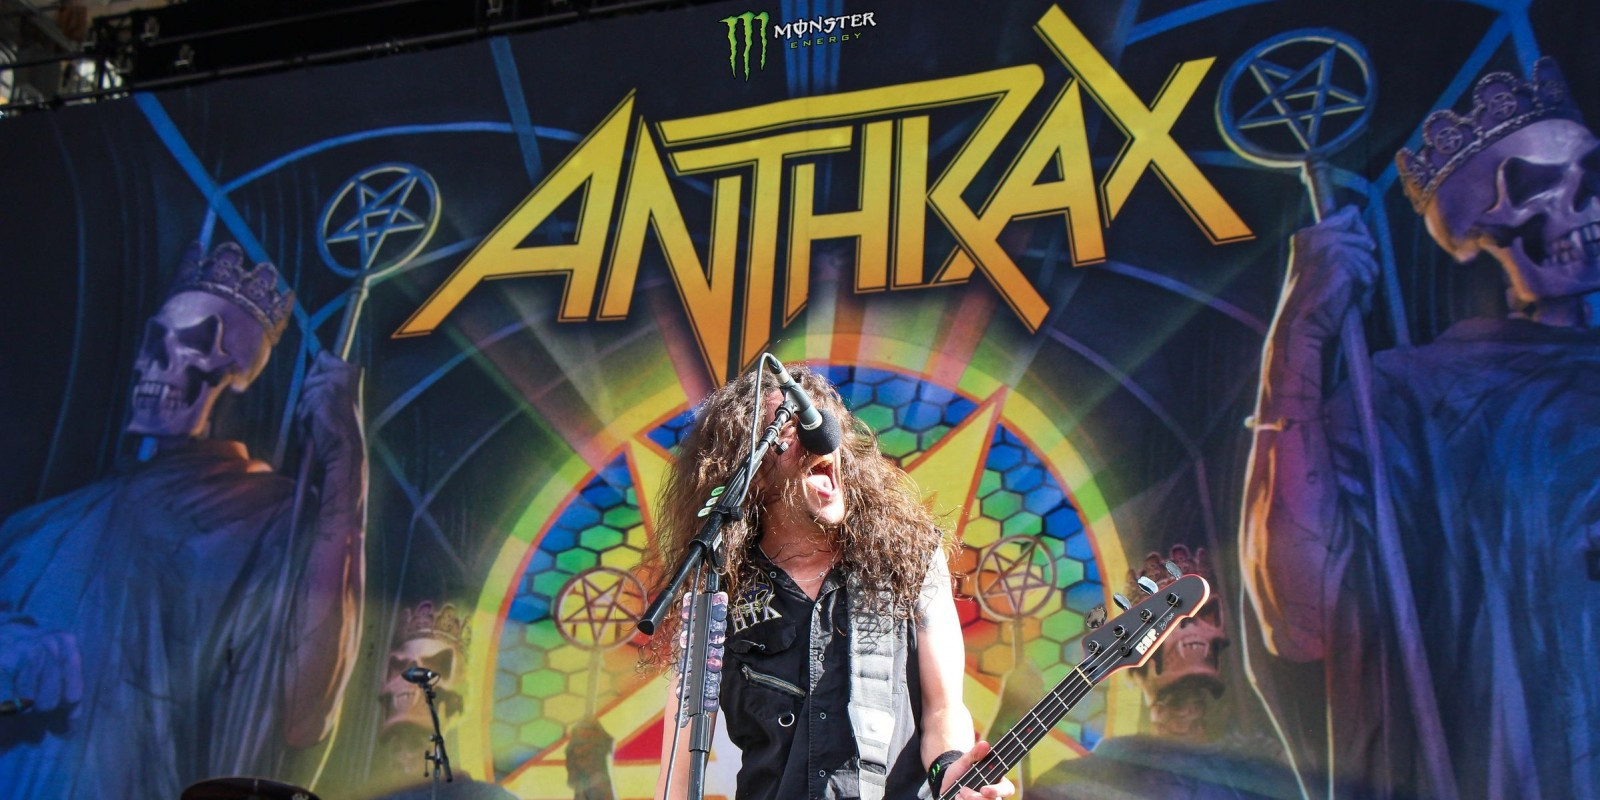 Frank Bello Anthrax hero image